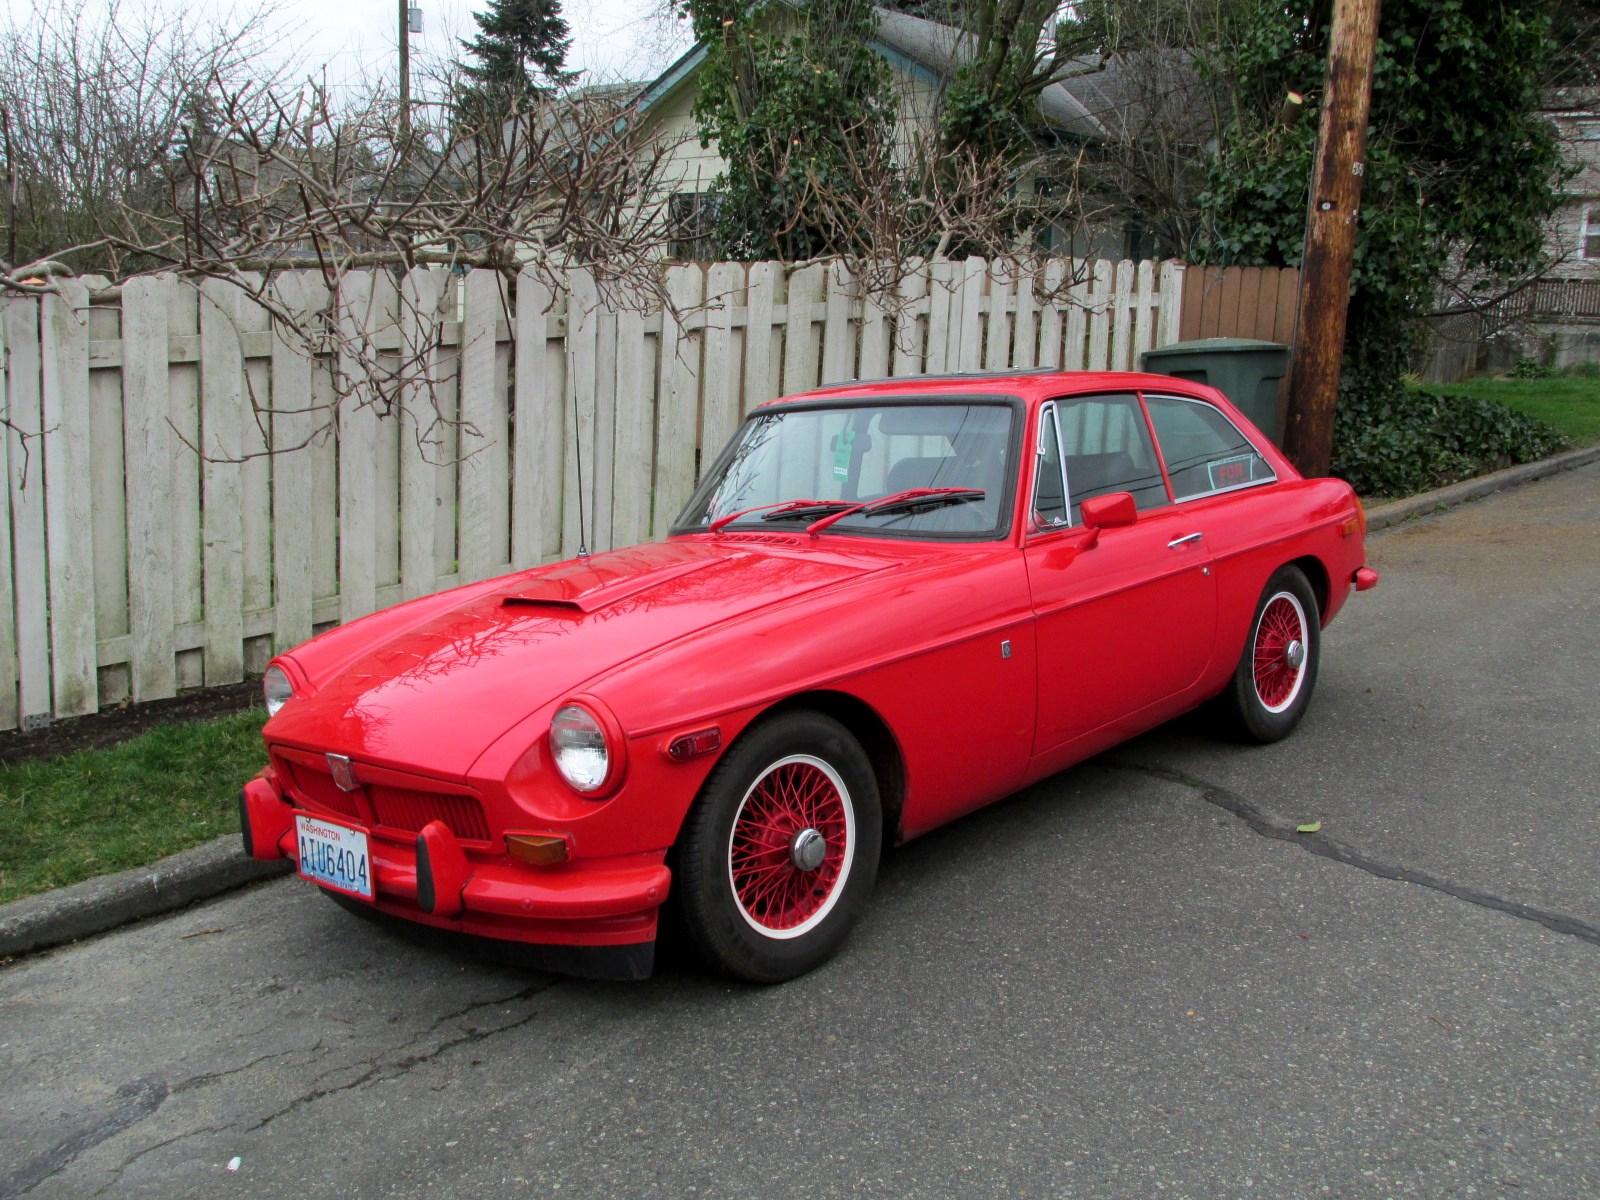 Seattles Classics 1970 MG MGB GT